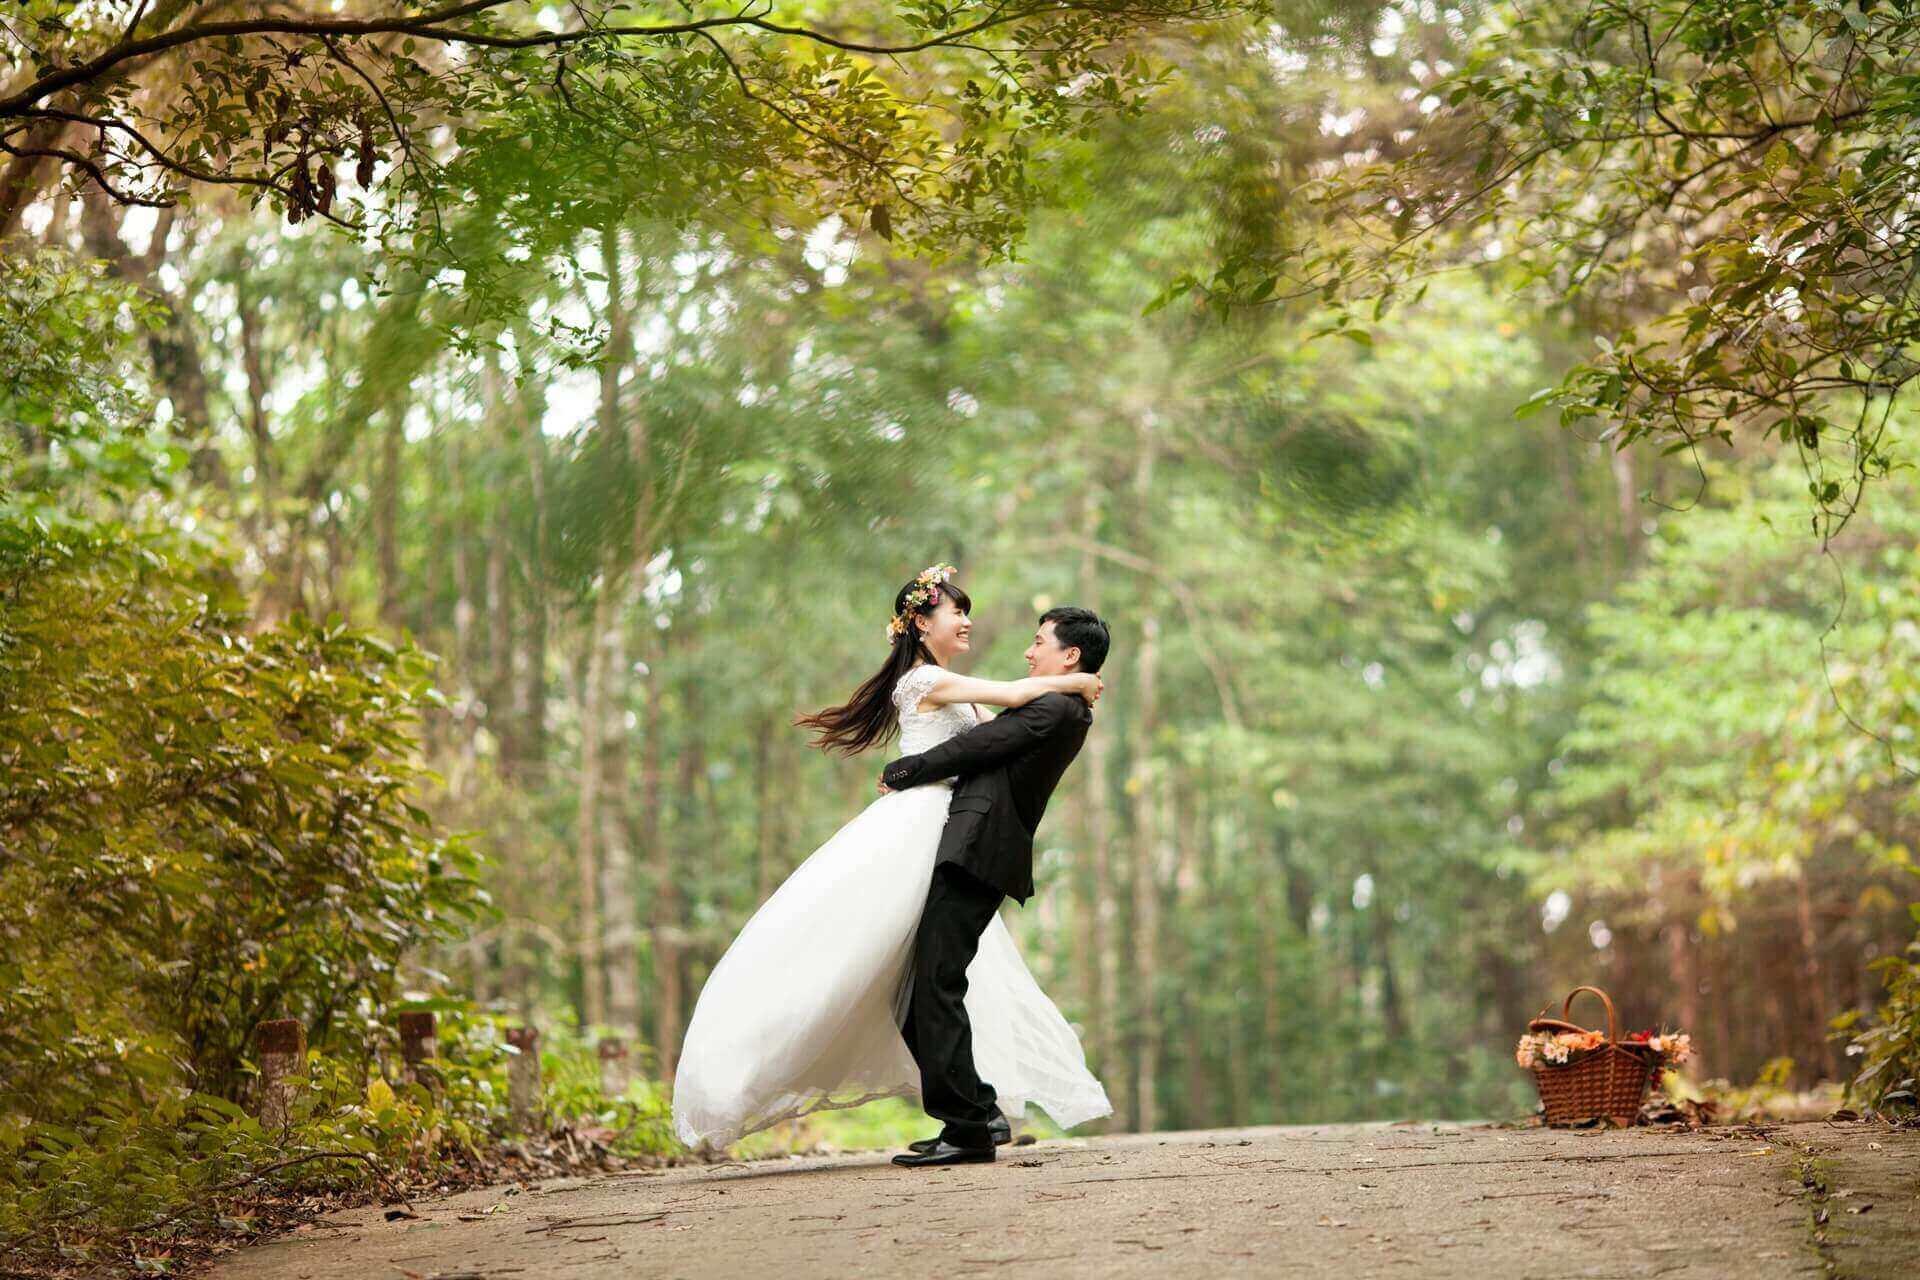 Western custom of the white wedding